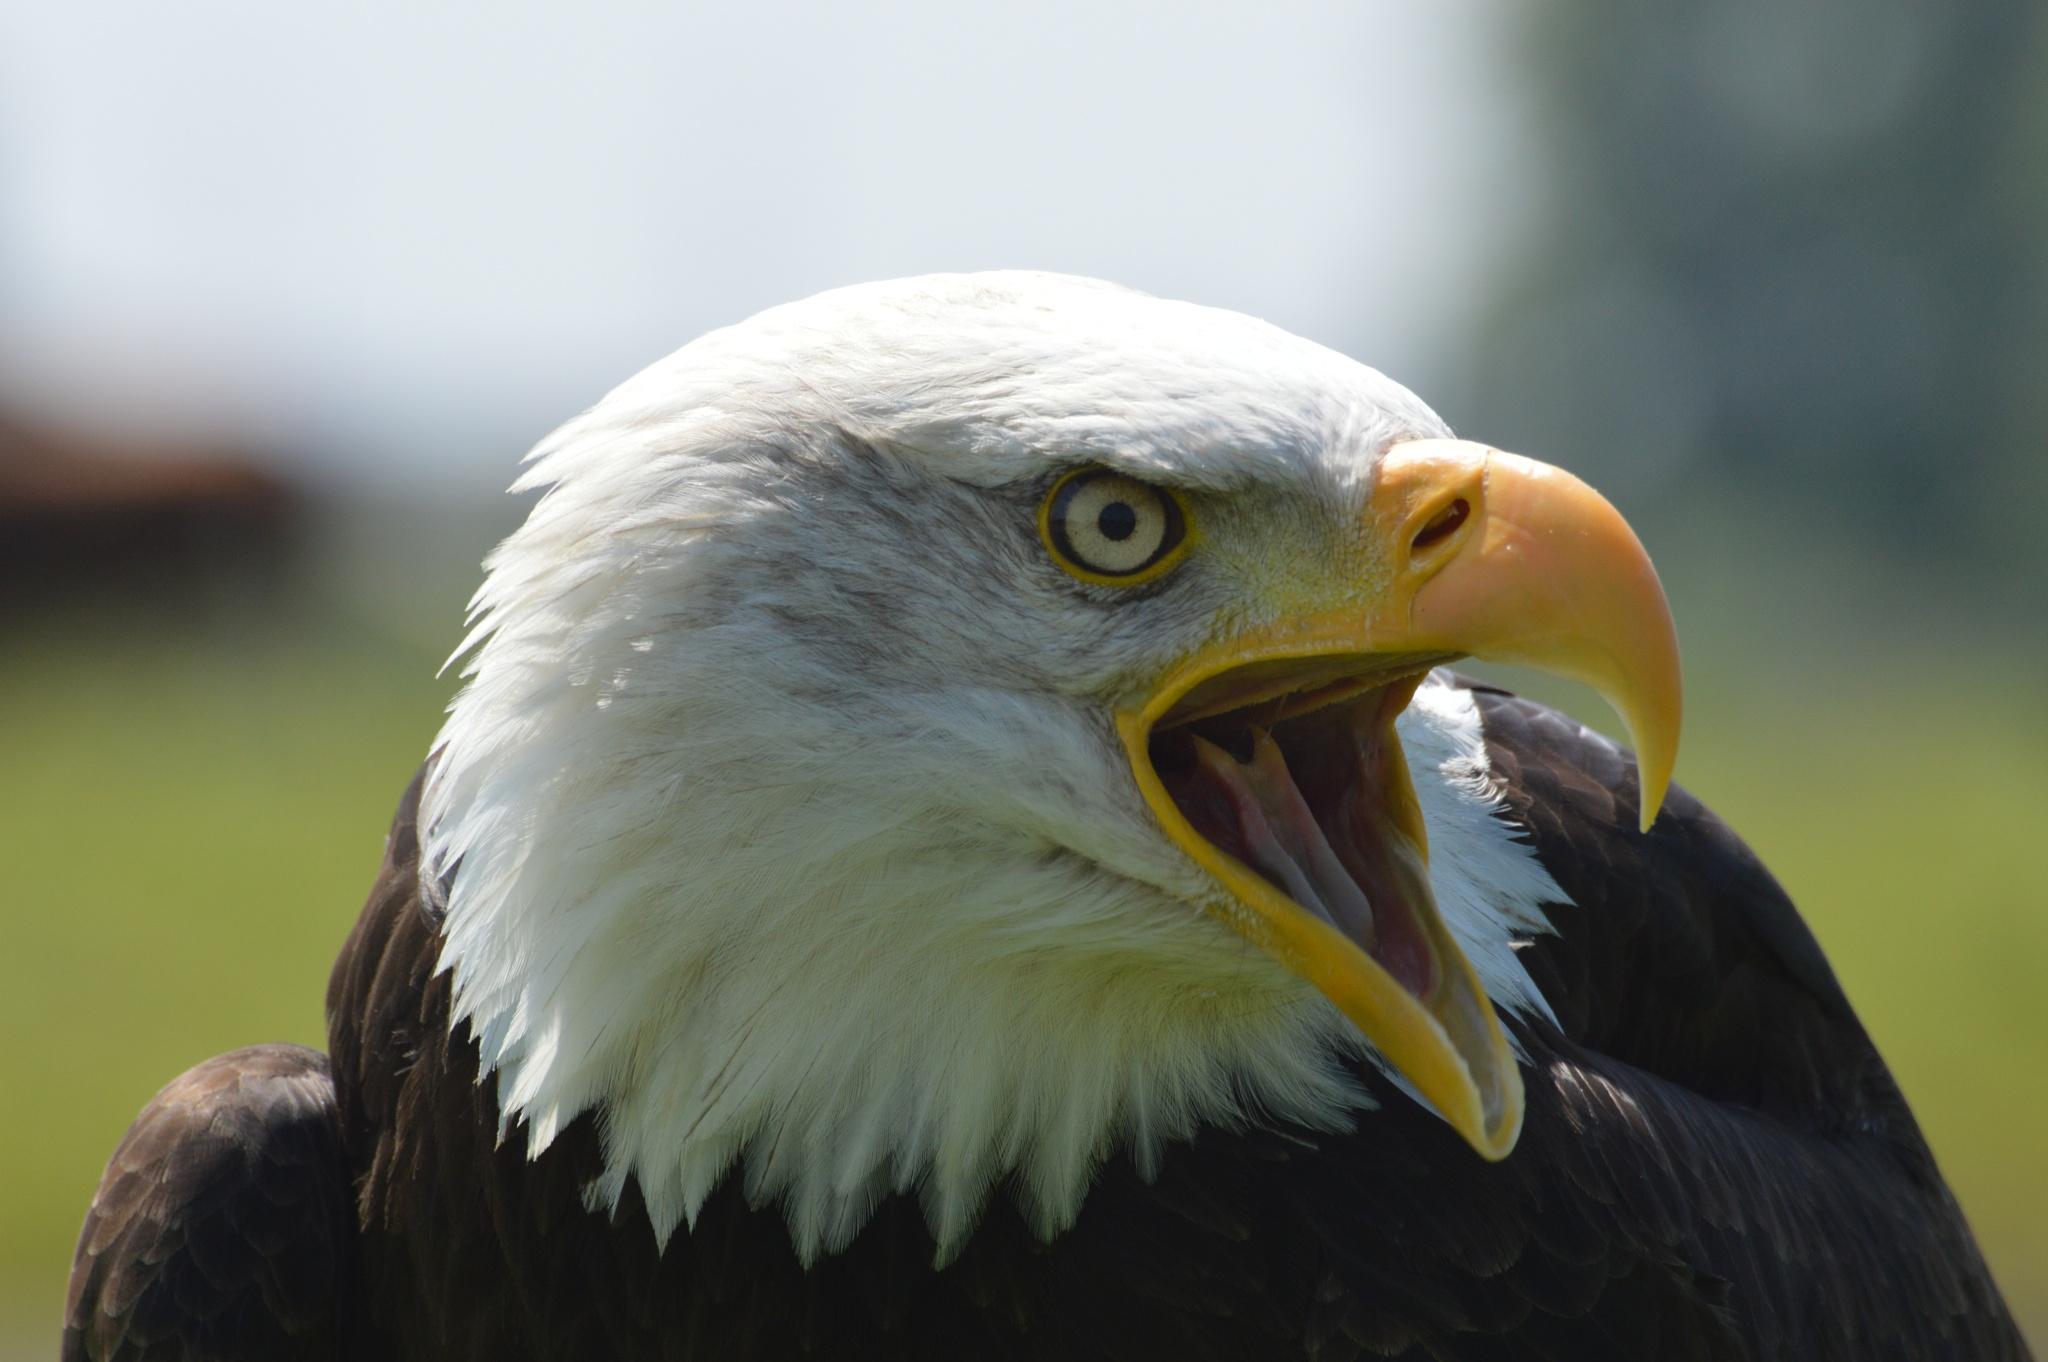 sea eagle by martin vuurpijl